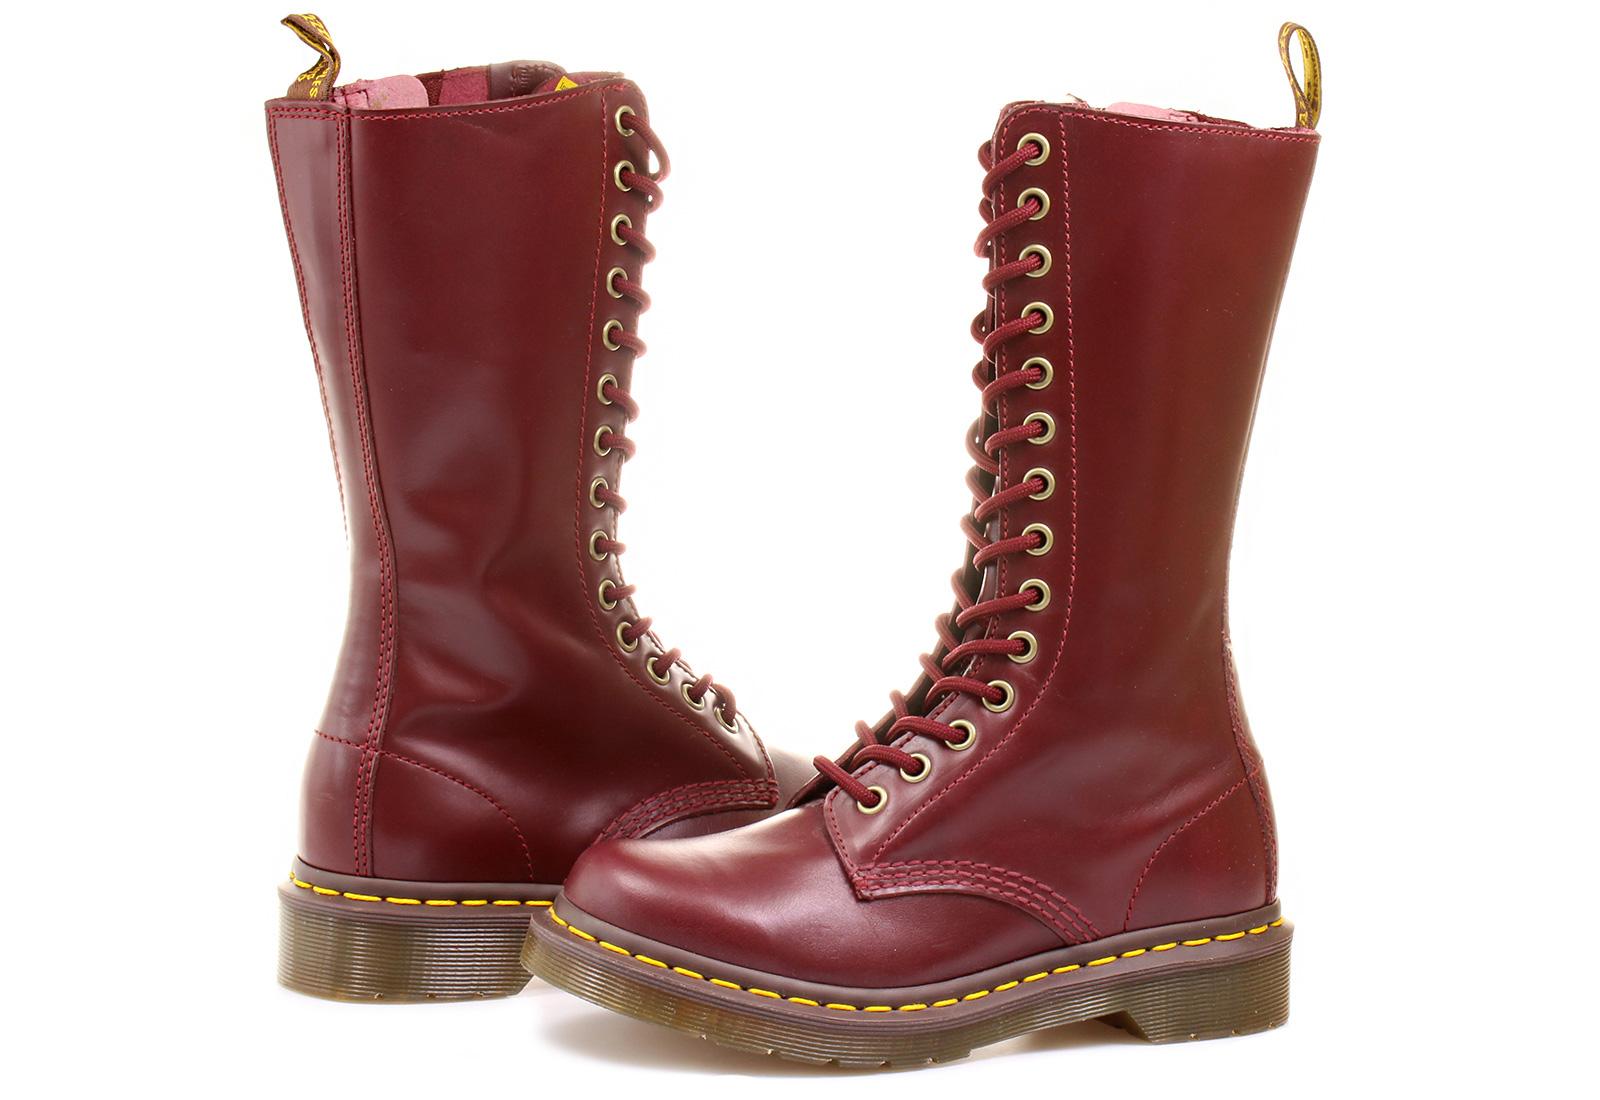 Dr Martens Bakancs - 1b99 - 11820603 - Office Shoes Magyarország e2d53c3c58